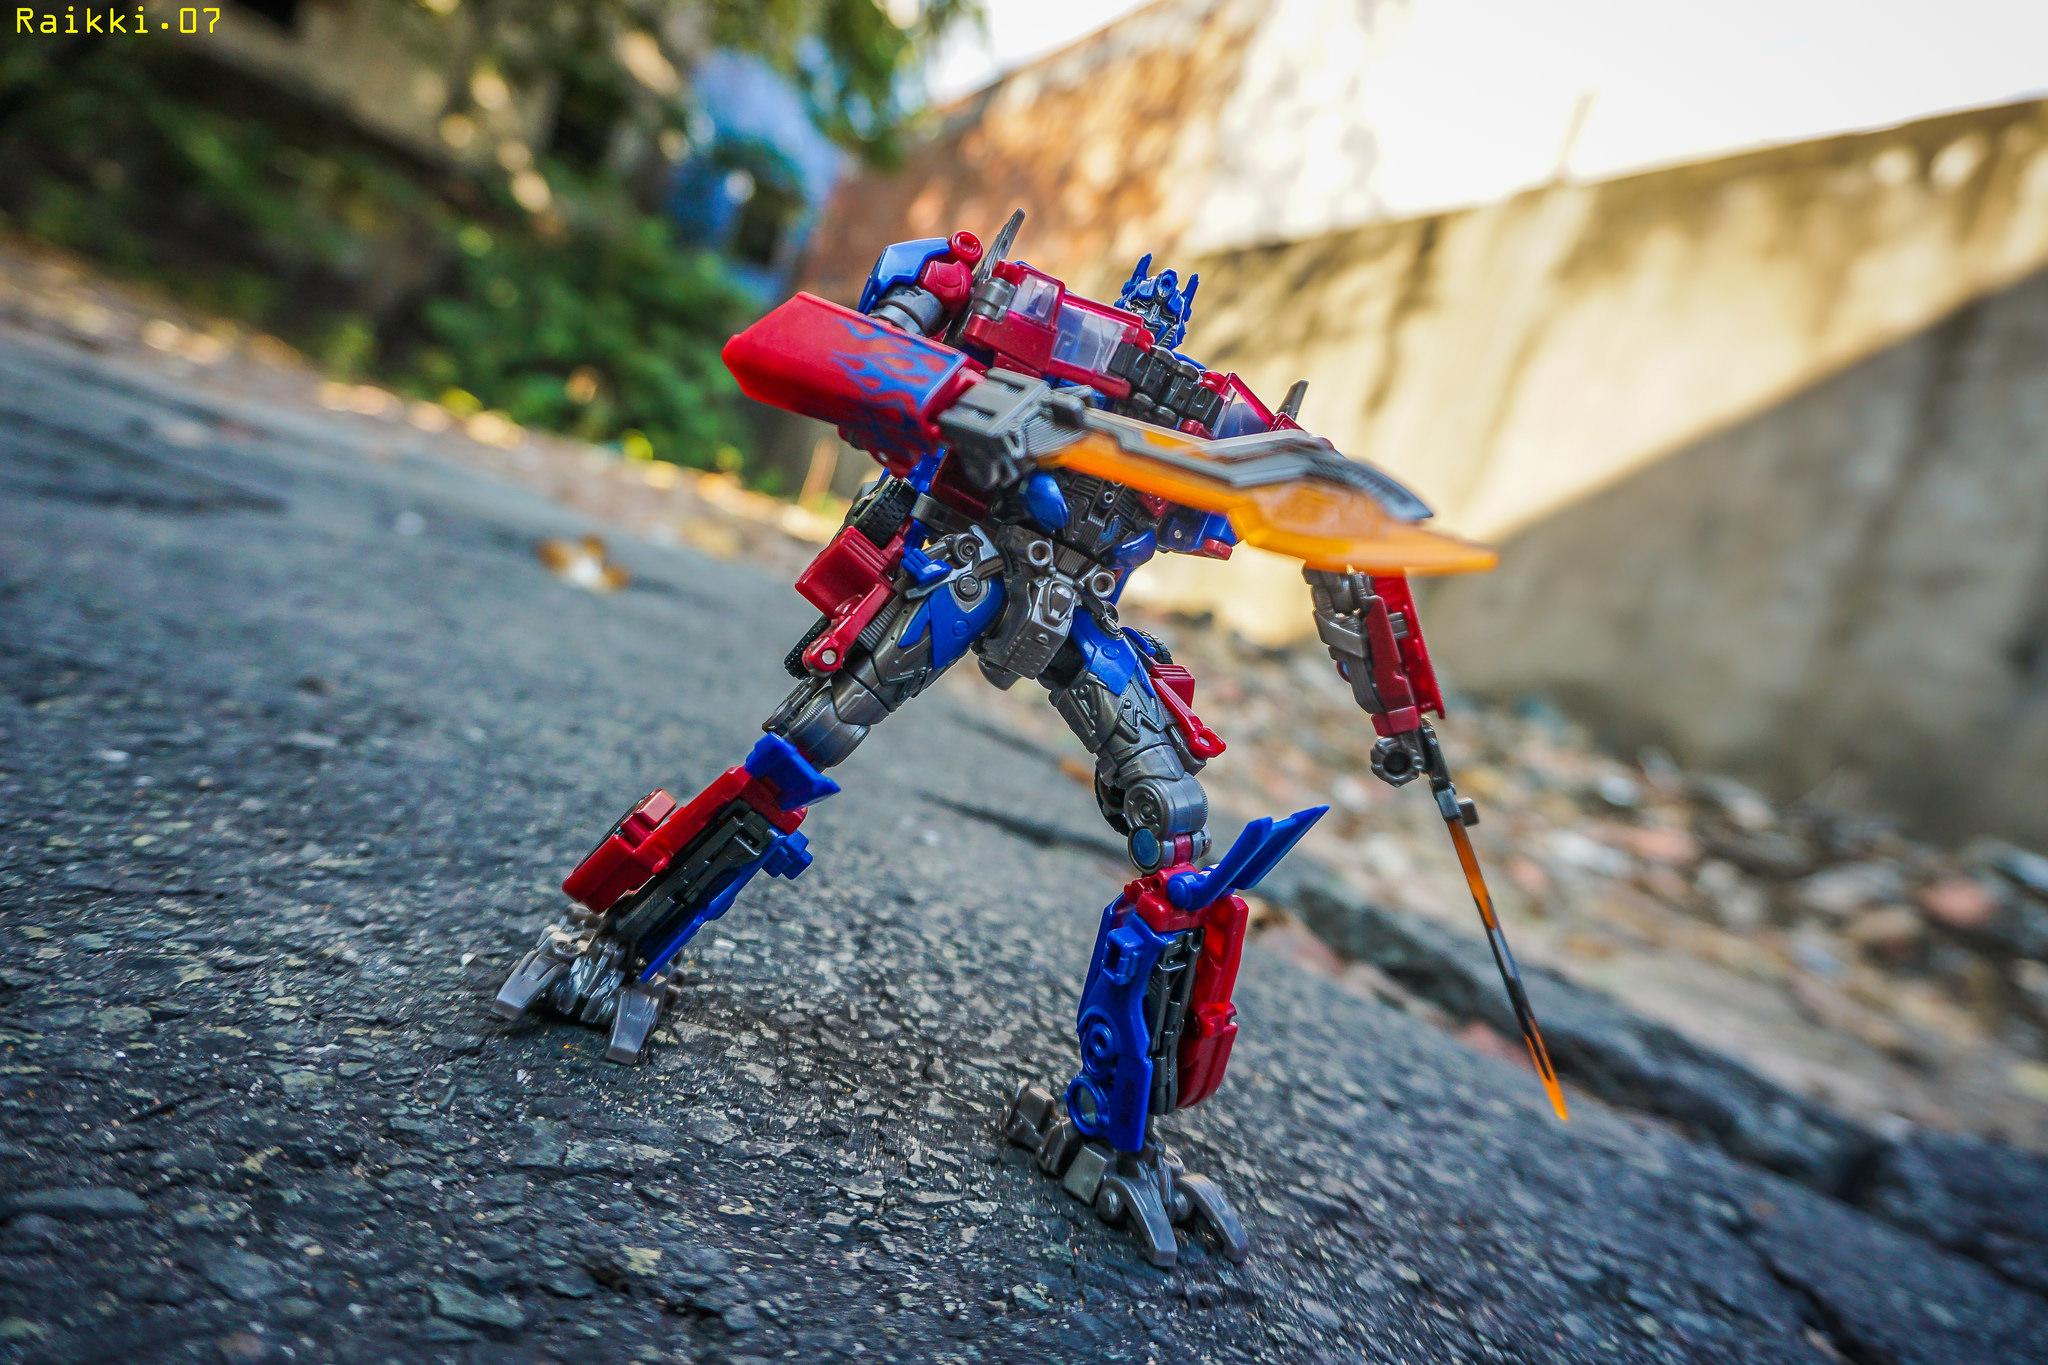 Hasbro Transformers Studio Series Optimus Prime Optimus Prime 05 Voyager Class